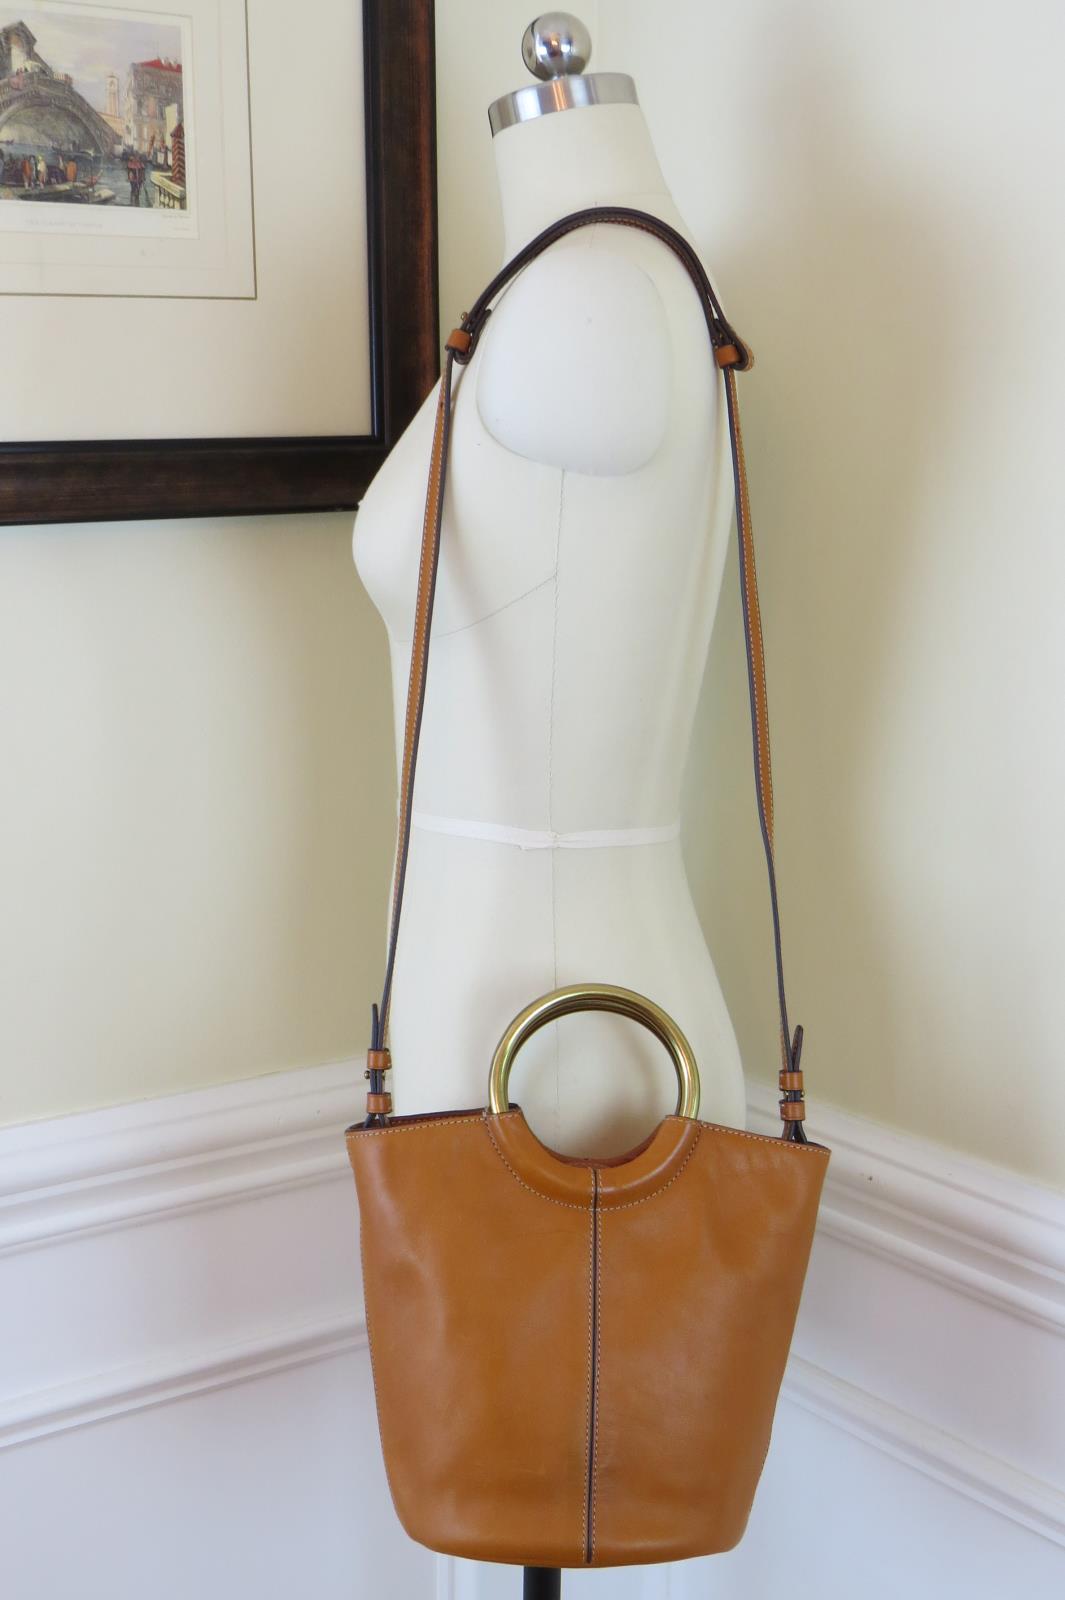 32a41e29ebd1 Details about JCrew Bracelet Bucket Bag Italan Leather Handbag H5001  178  Copper Natural